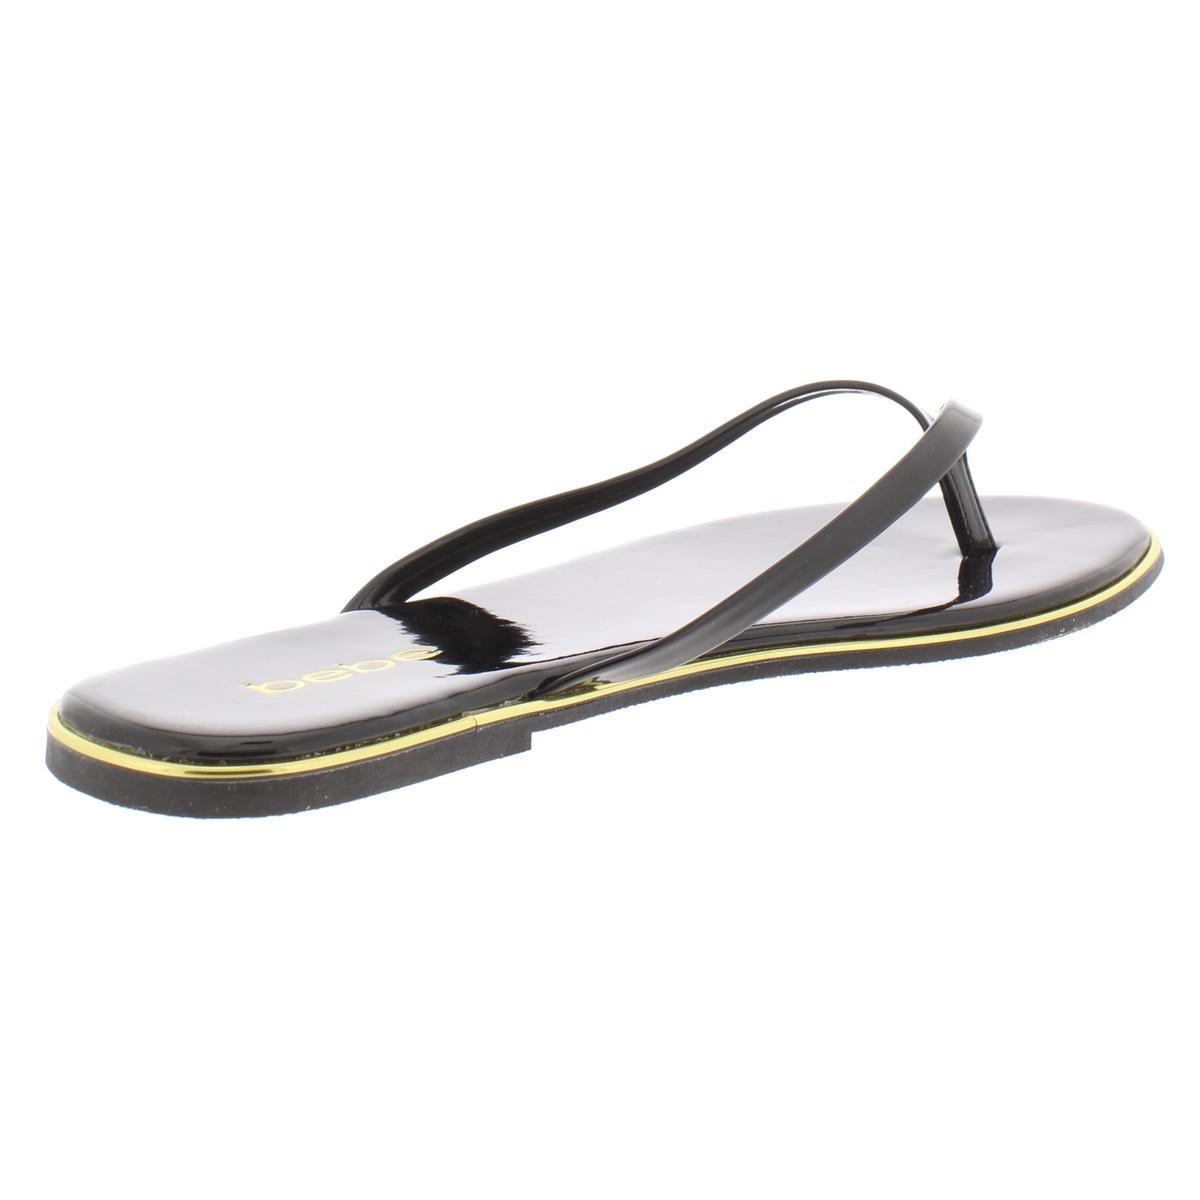 Bebe-Womens-Ilistra-Patent-Slide-Flip-Flops-Shoes-BHFO-7633 thumbnail 4